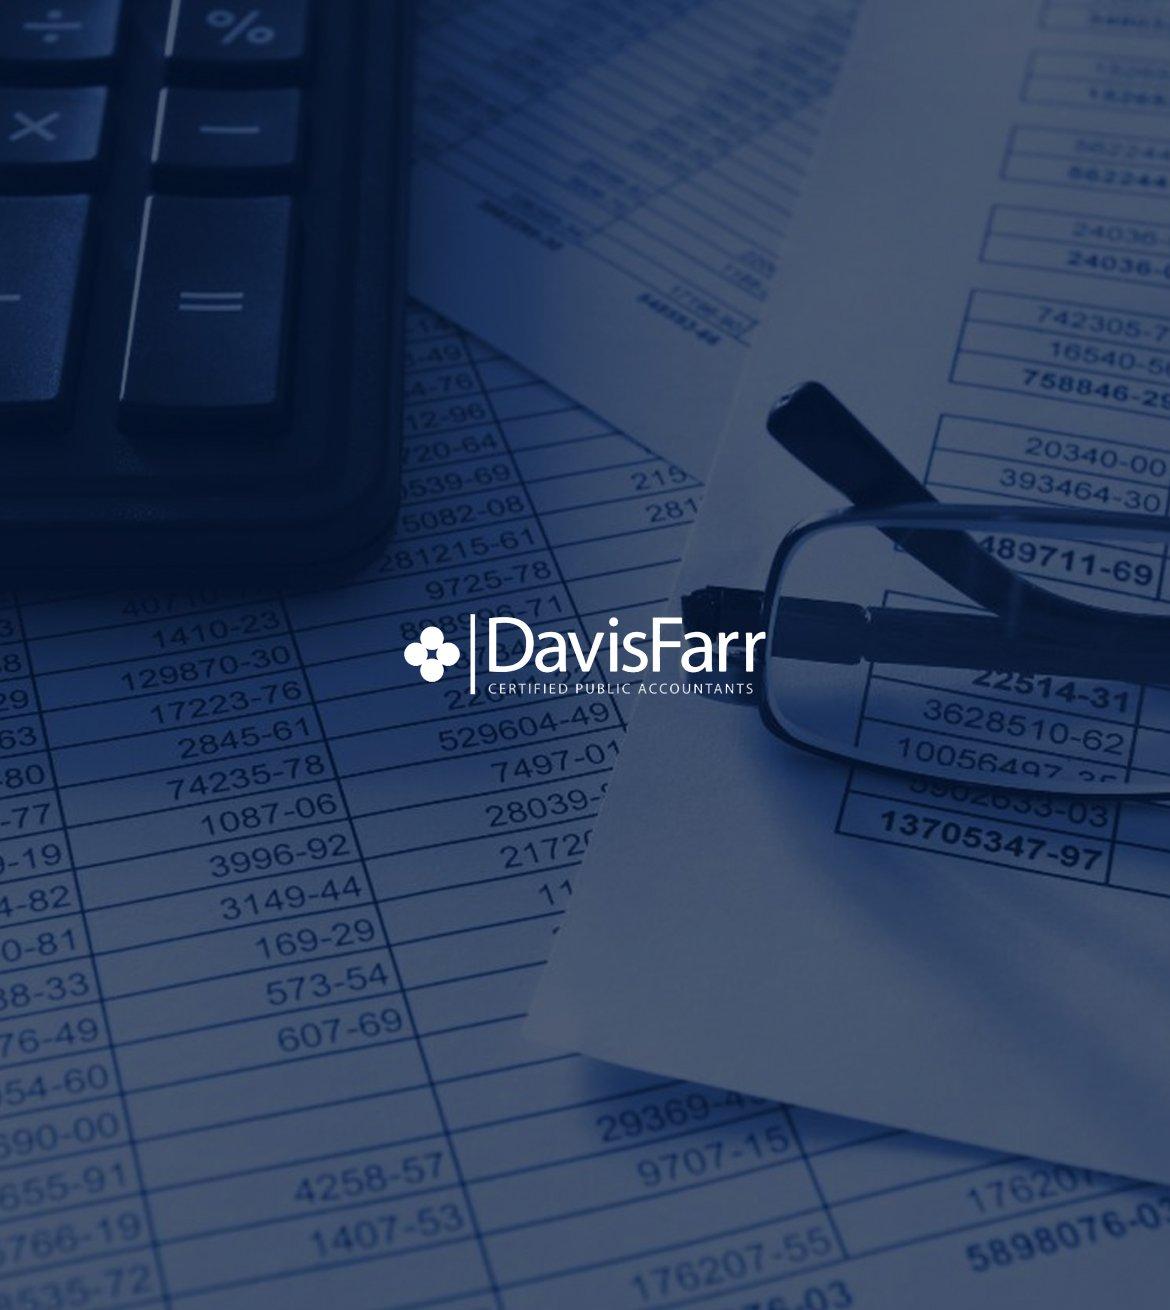 Davis Farr LLP